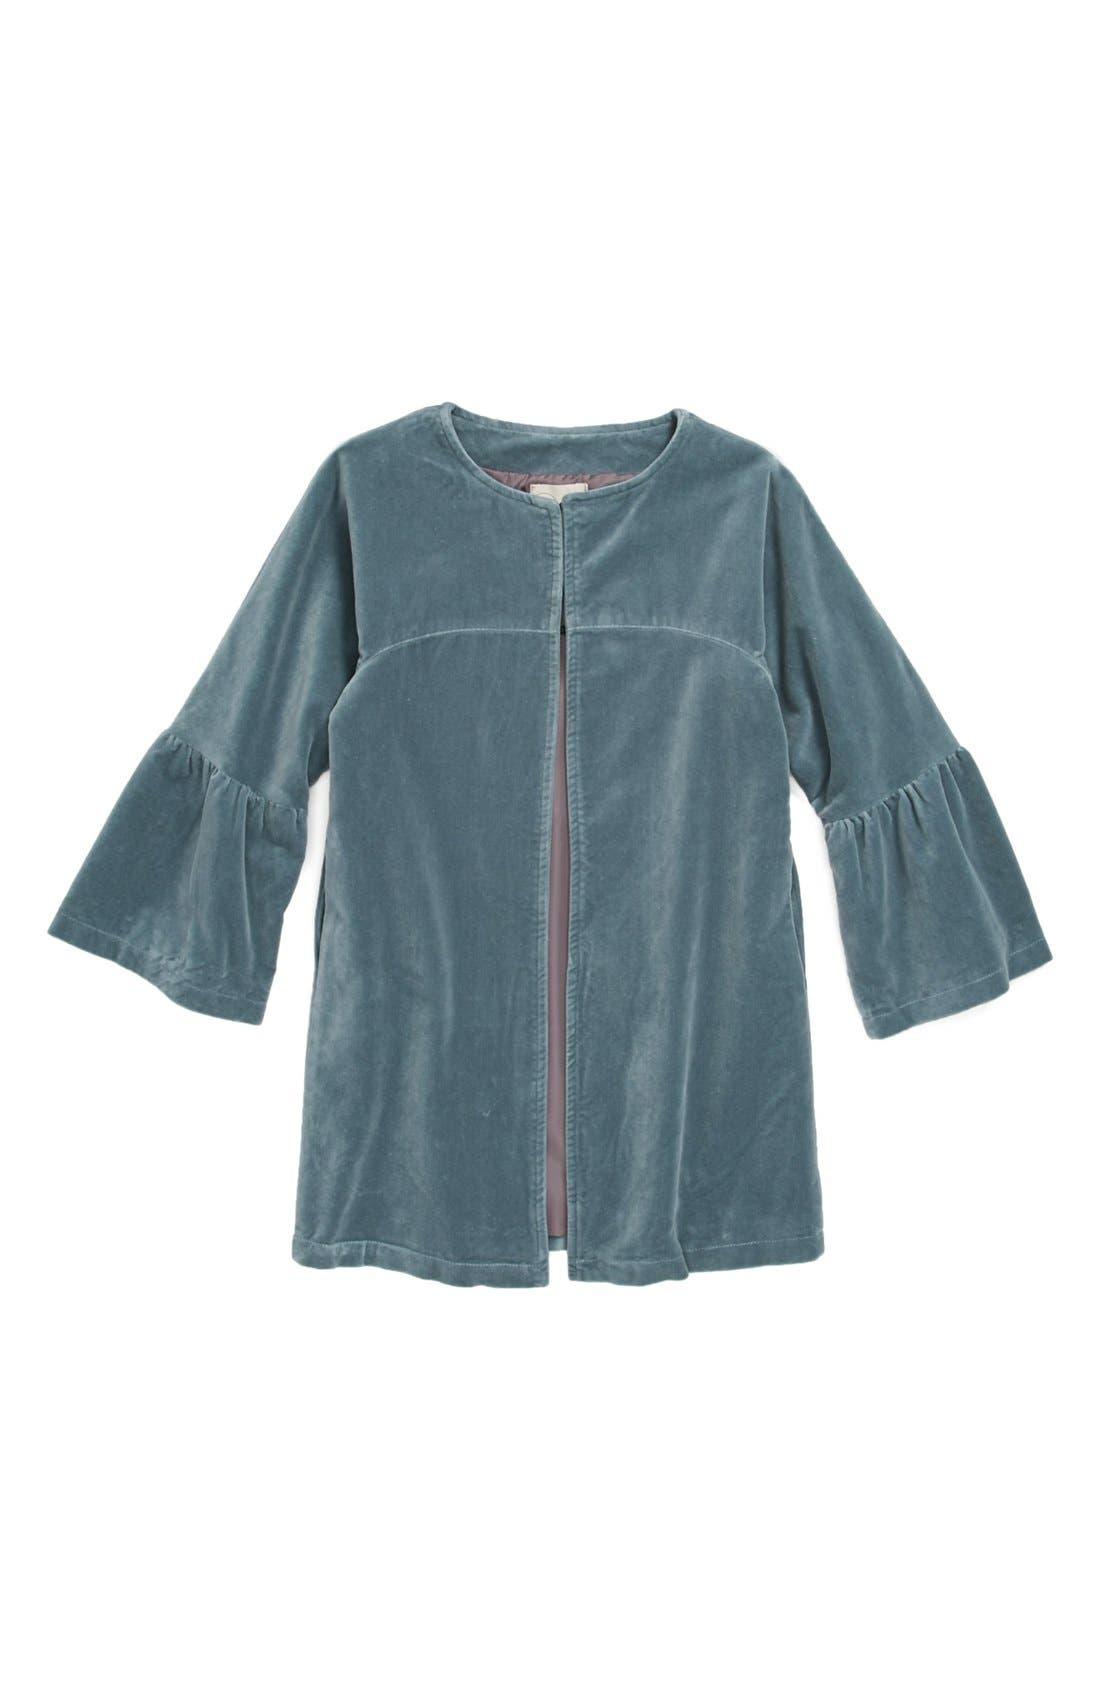 Alternate Image 1 Selected - Peek 'Florence' Coat (Toddler Girls, Little Girls & Big Girls)